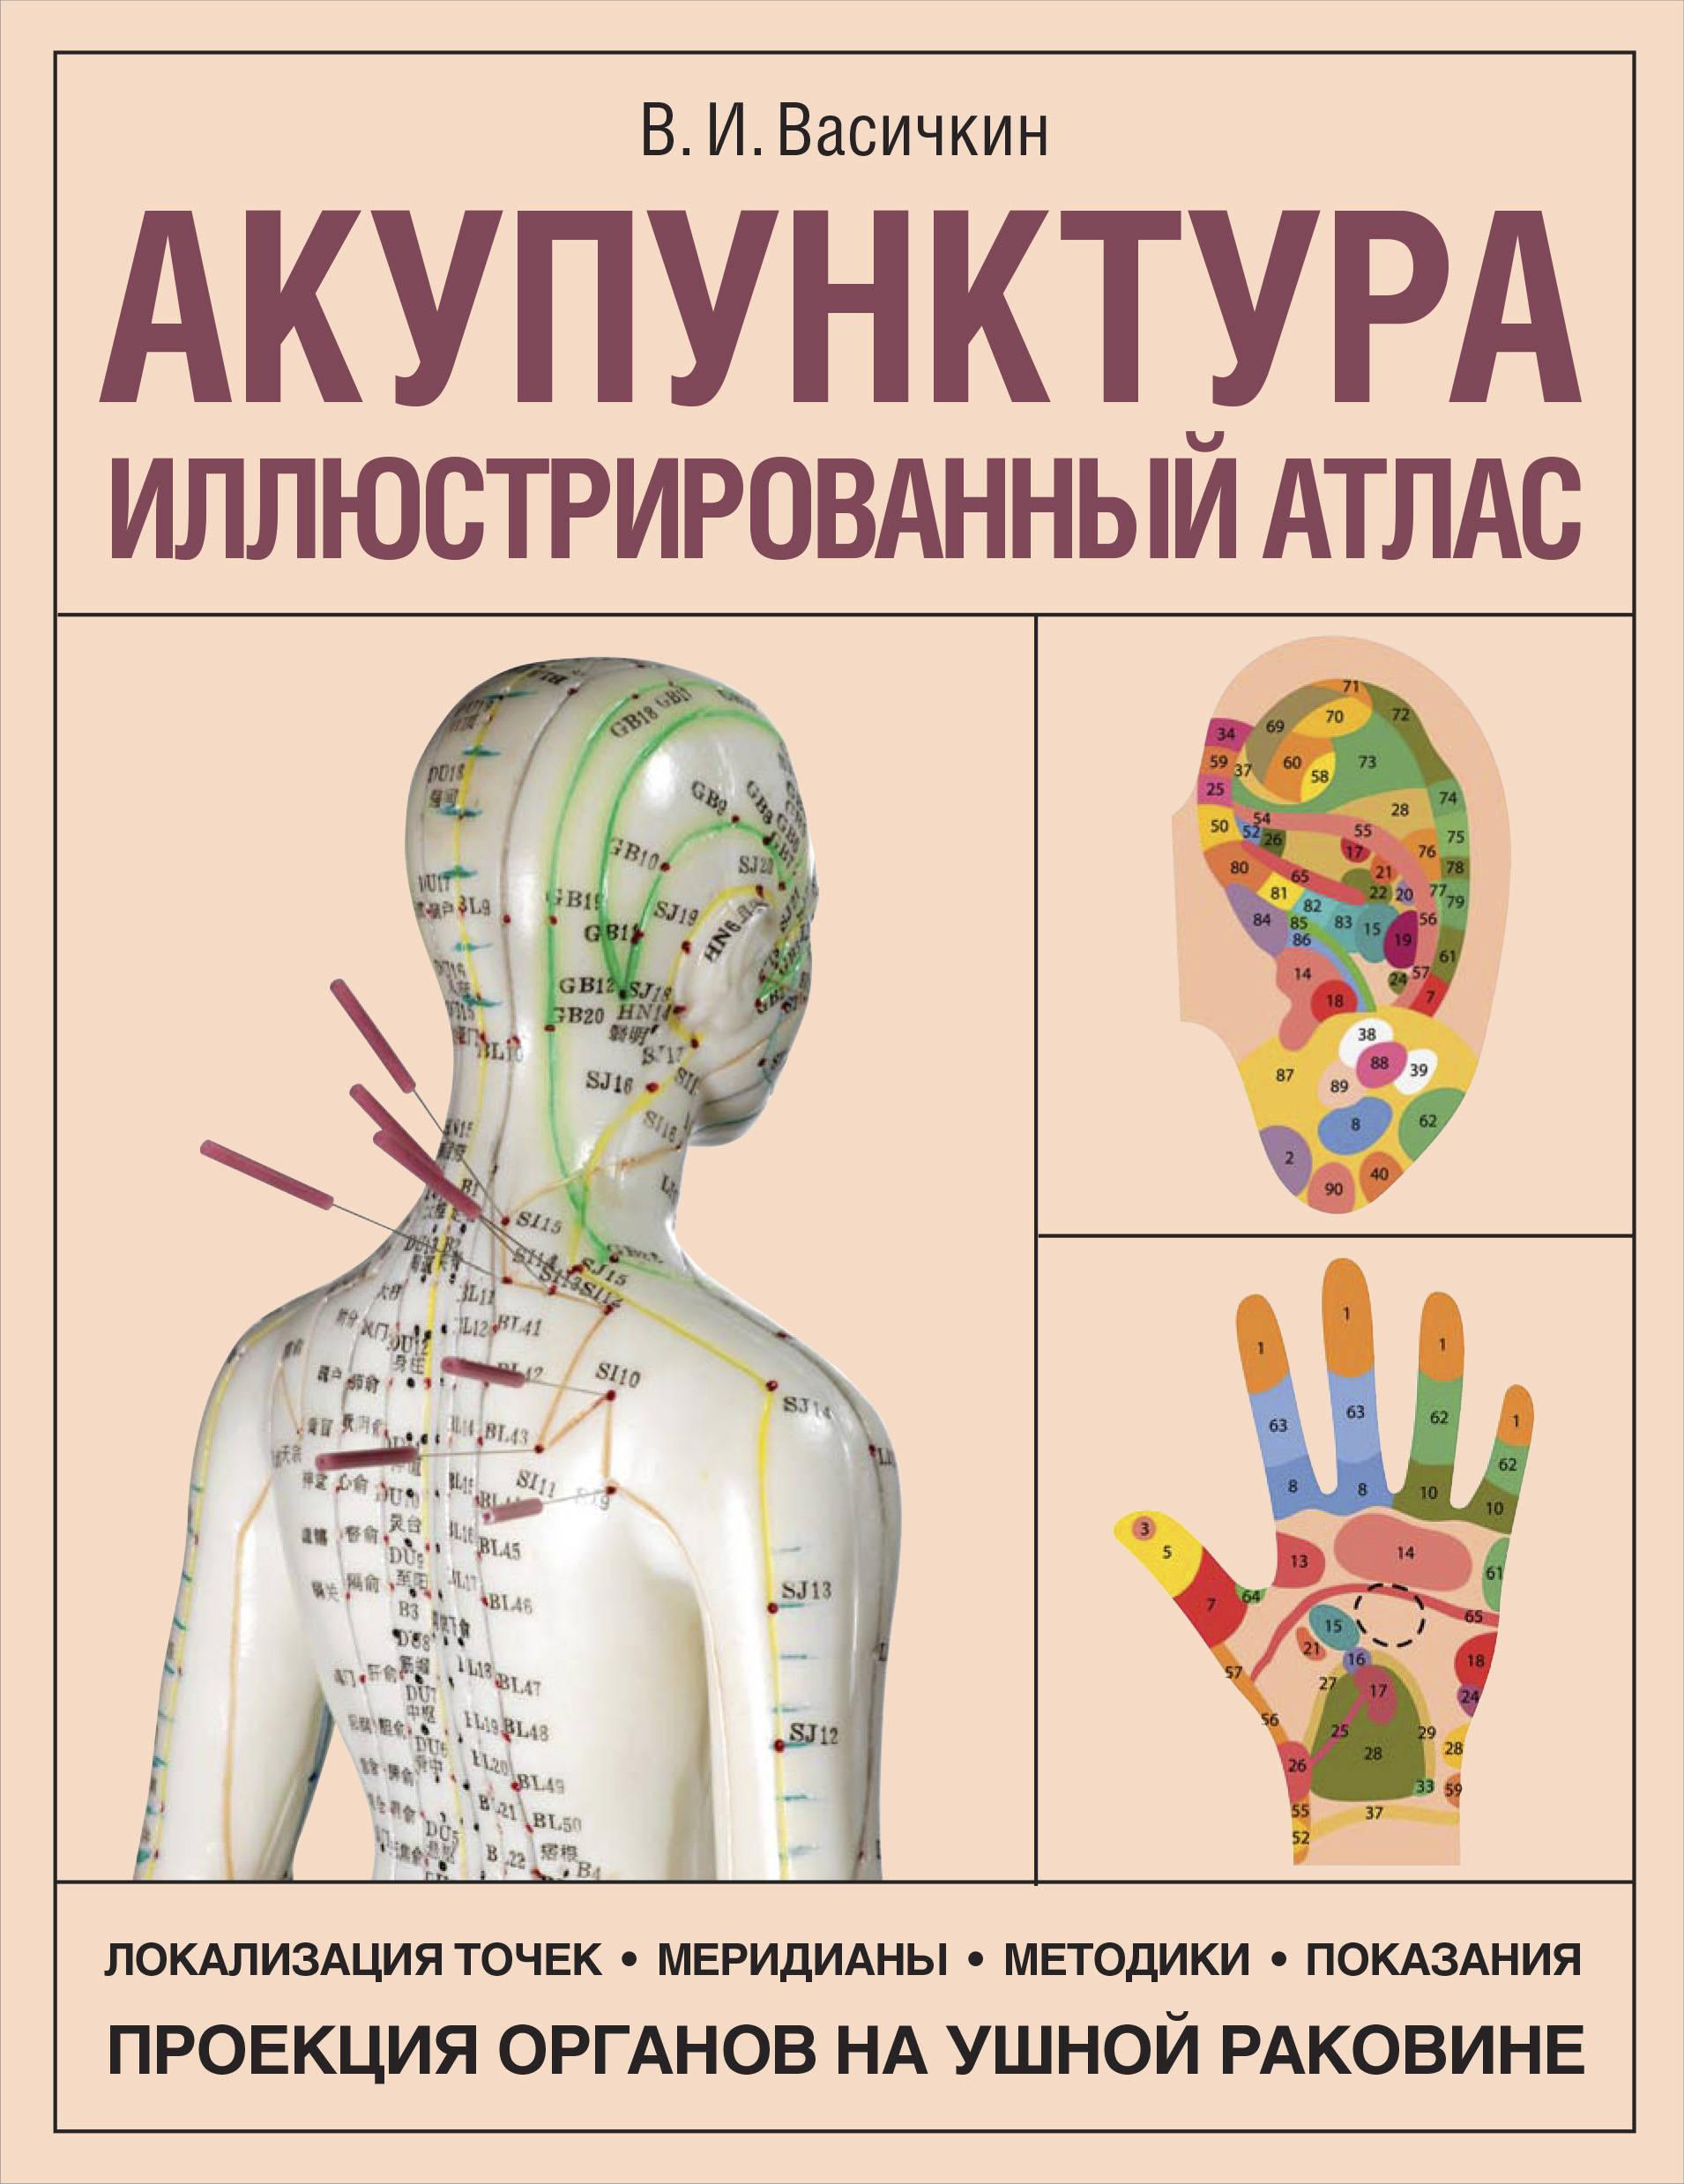 Akupunktura. Illjustrirovannyj atlas